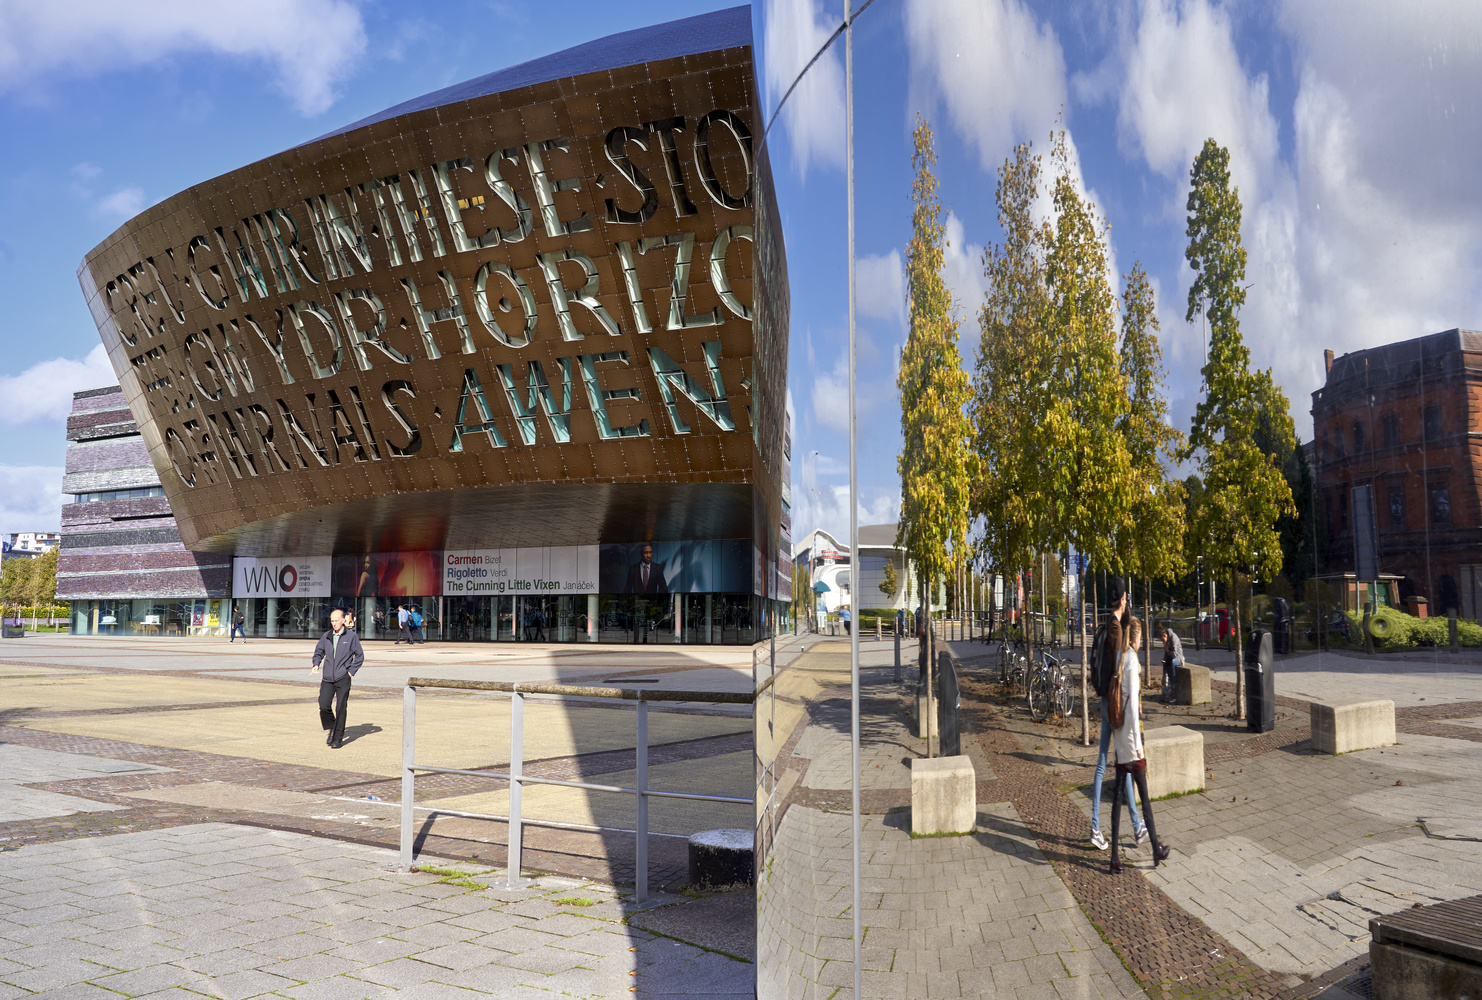 Wales Millennium Centre by Richard Downs